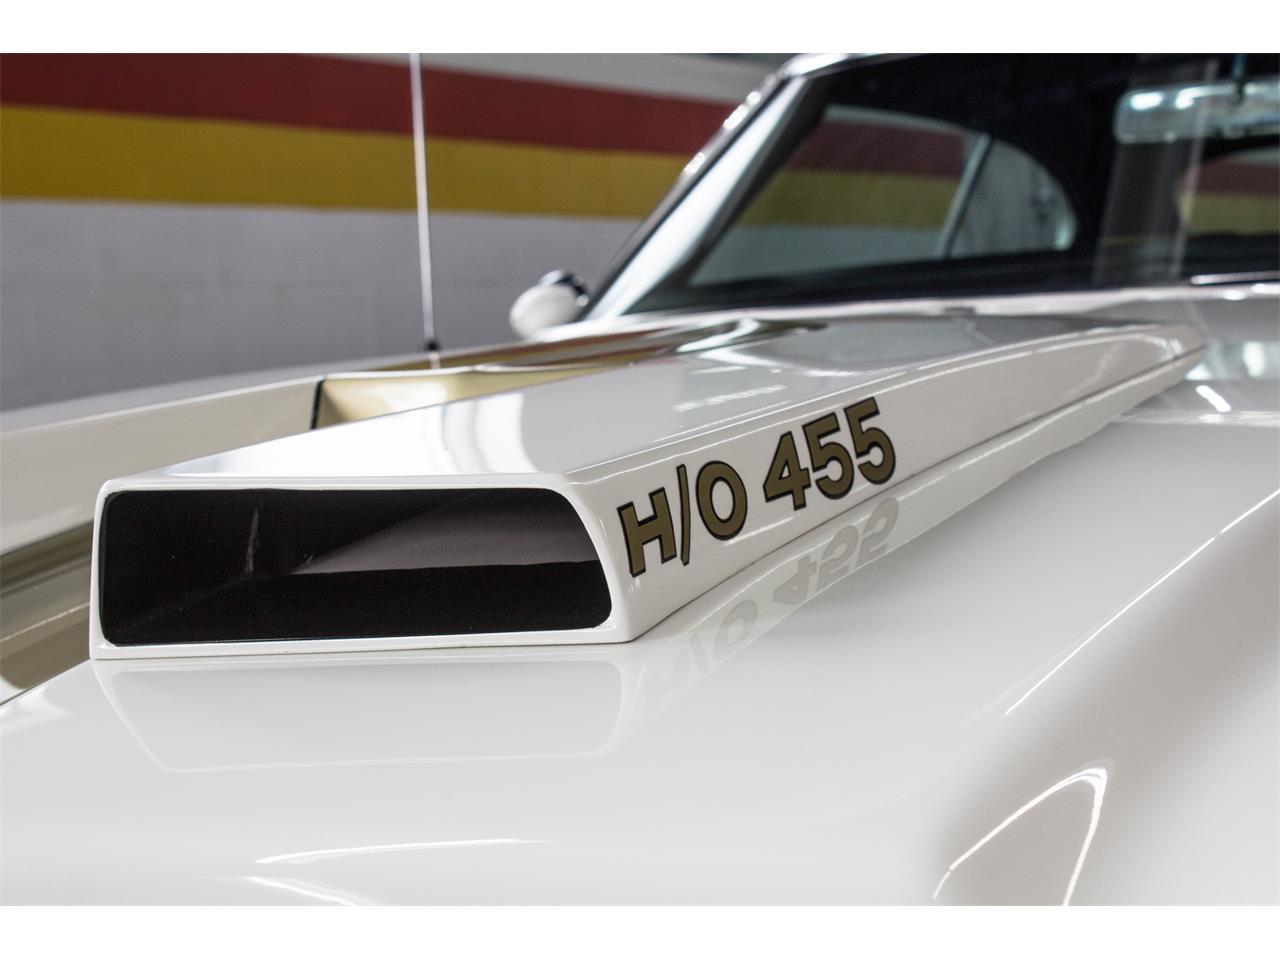 Large Picture of Classic '69 Hurst located in Quebec - $89,995.00 - GA07